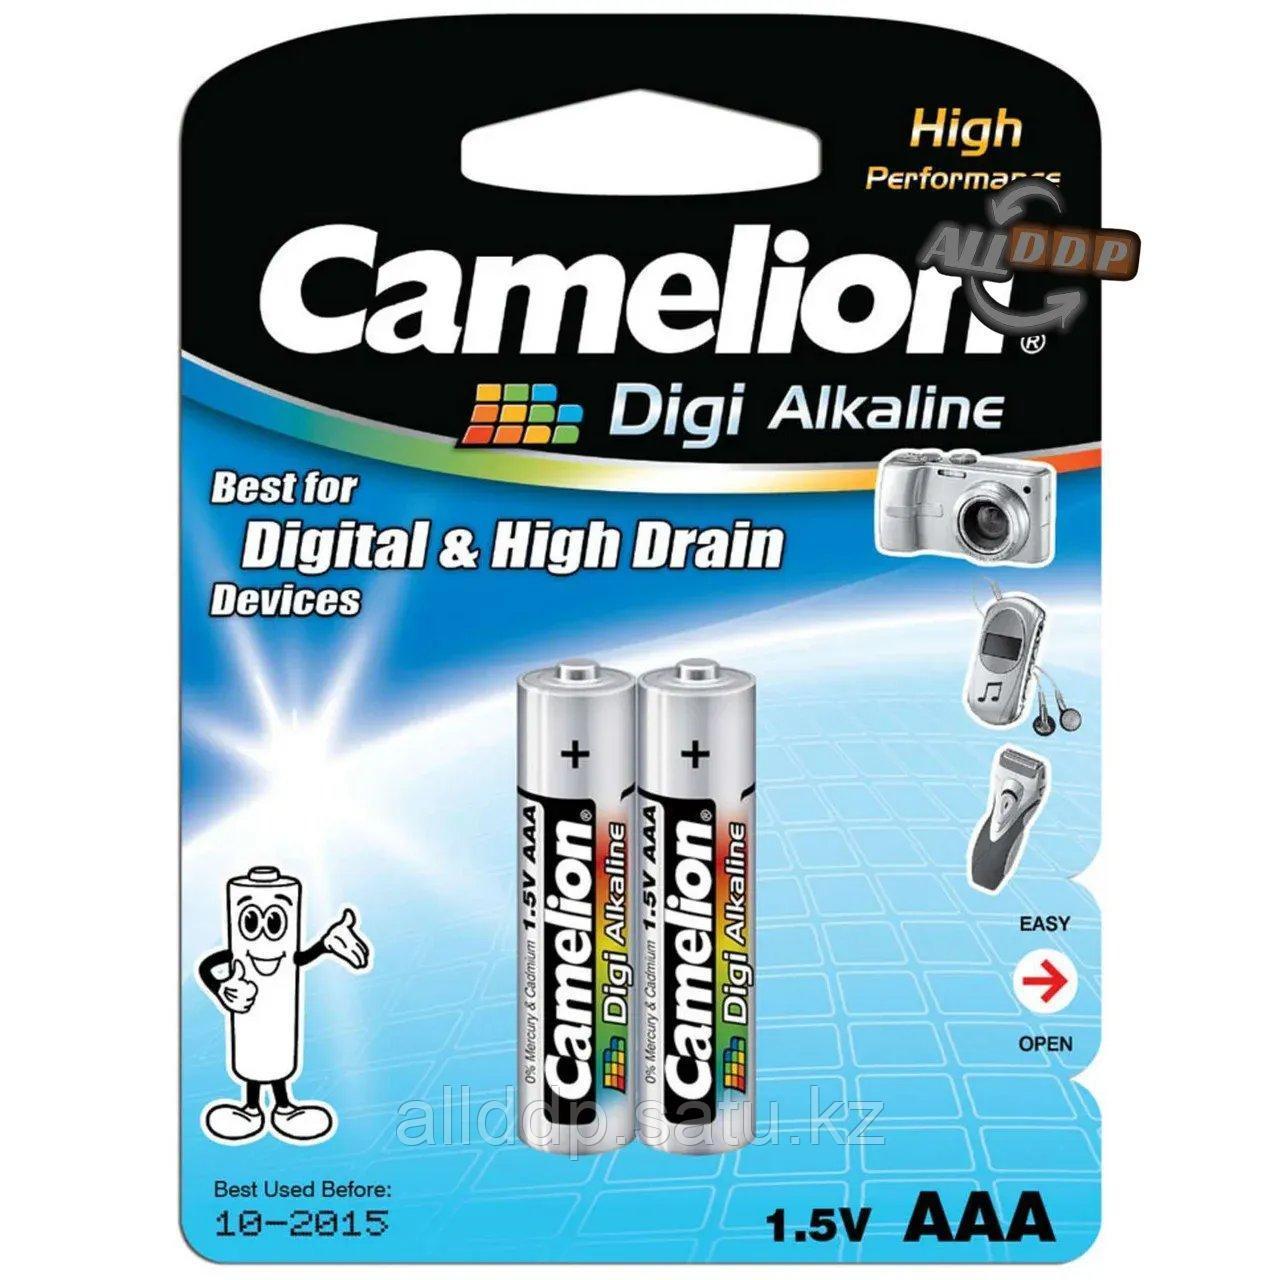 Батарейка Camelion Digi Alkaline 1.5V AAA